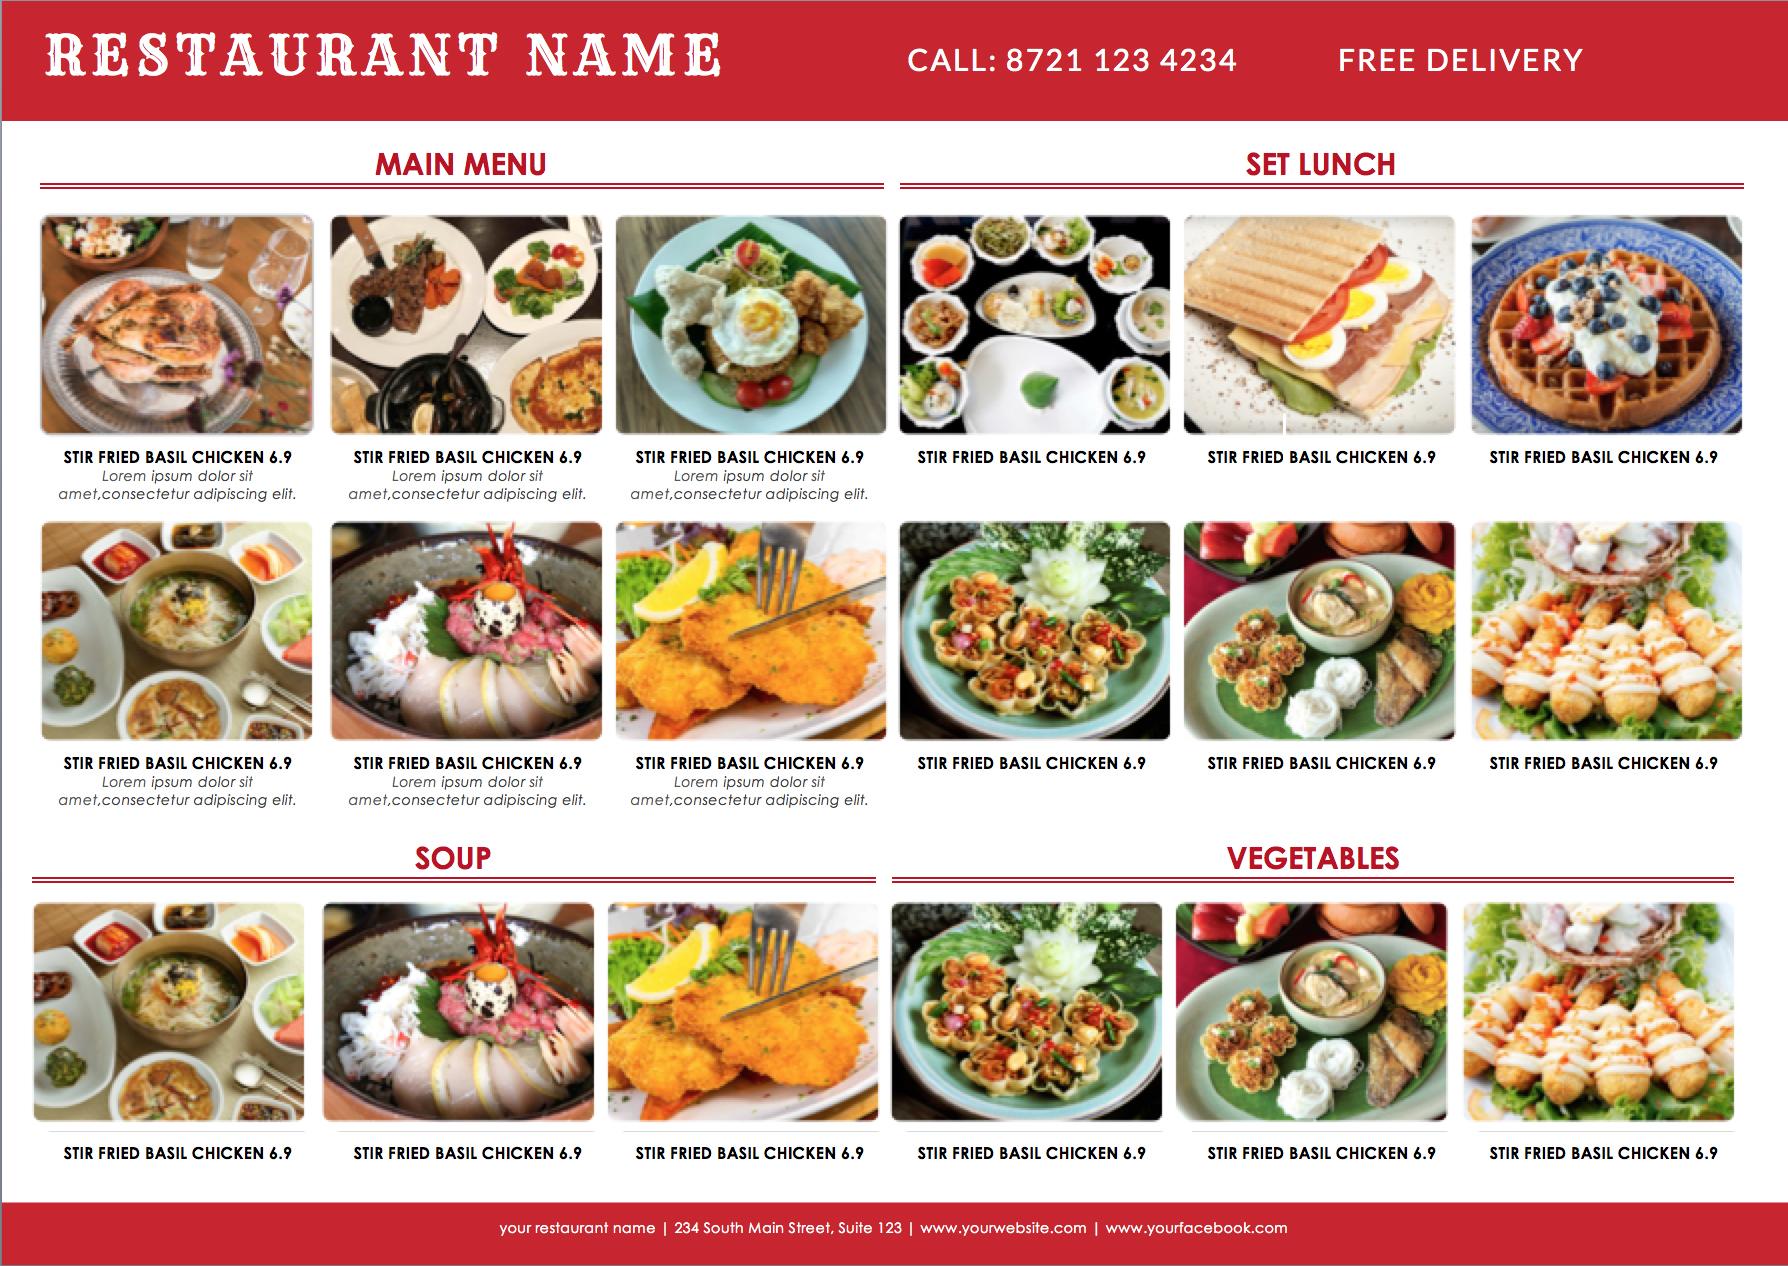 THAI MENU KORIA MENU ASIA FOOD